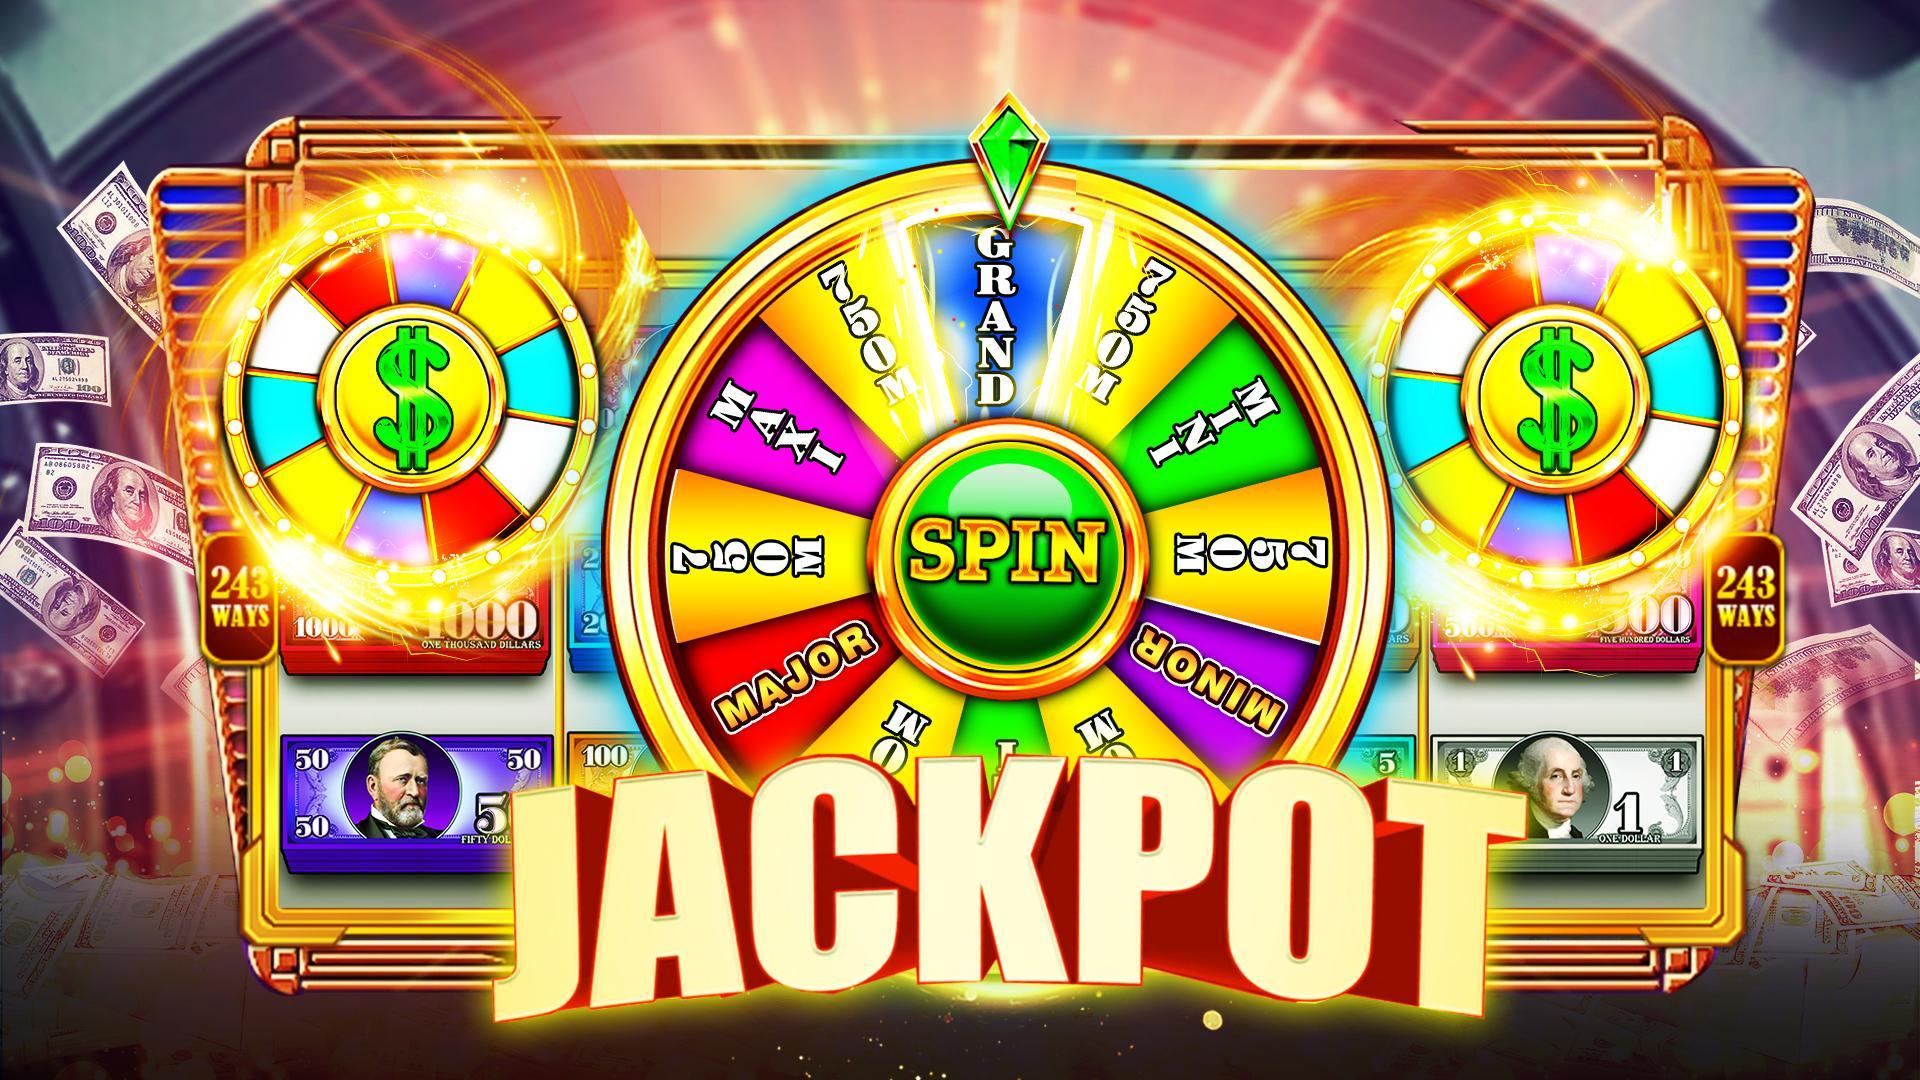 Jackpot De Casino